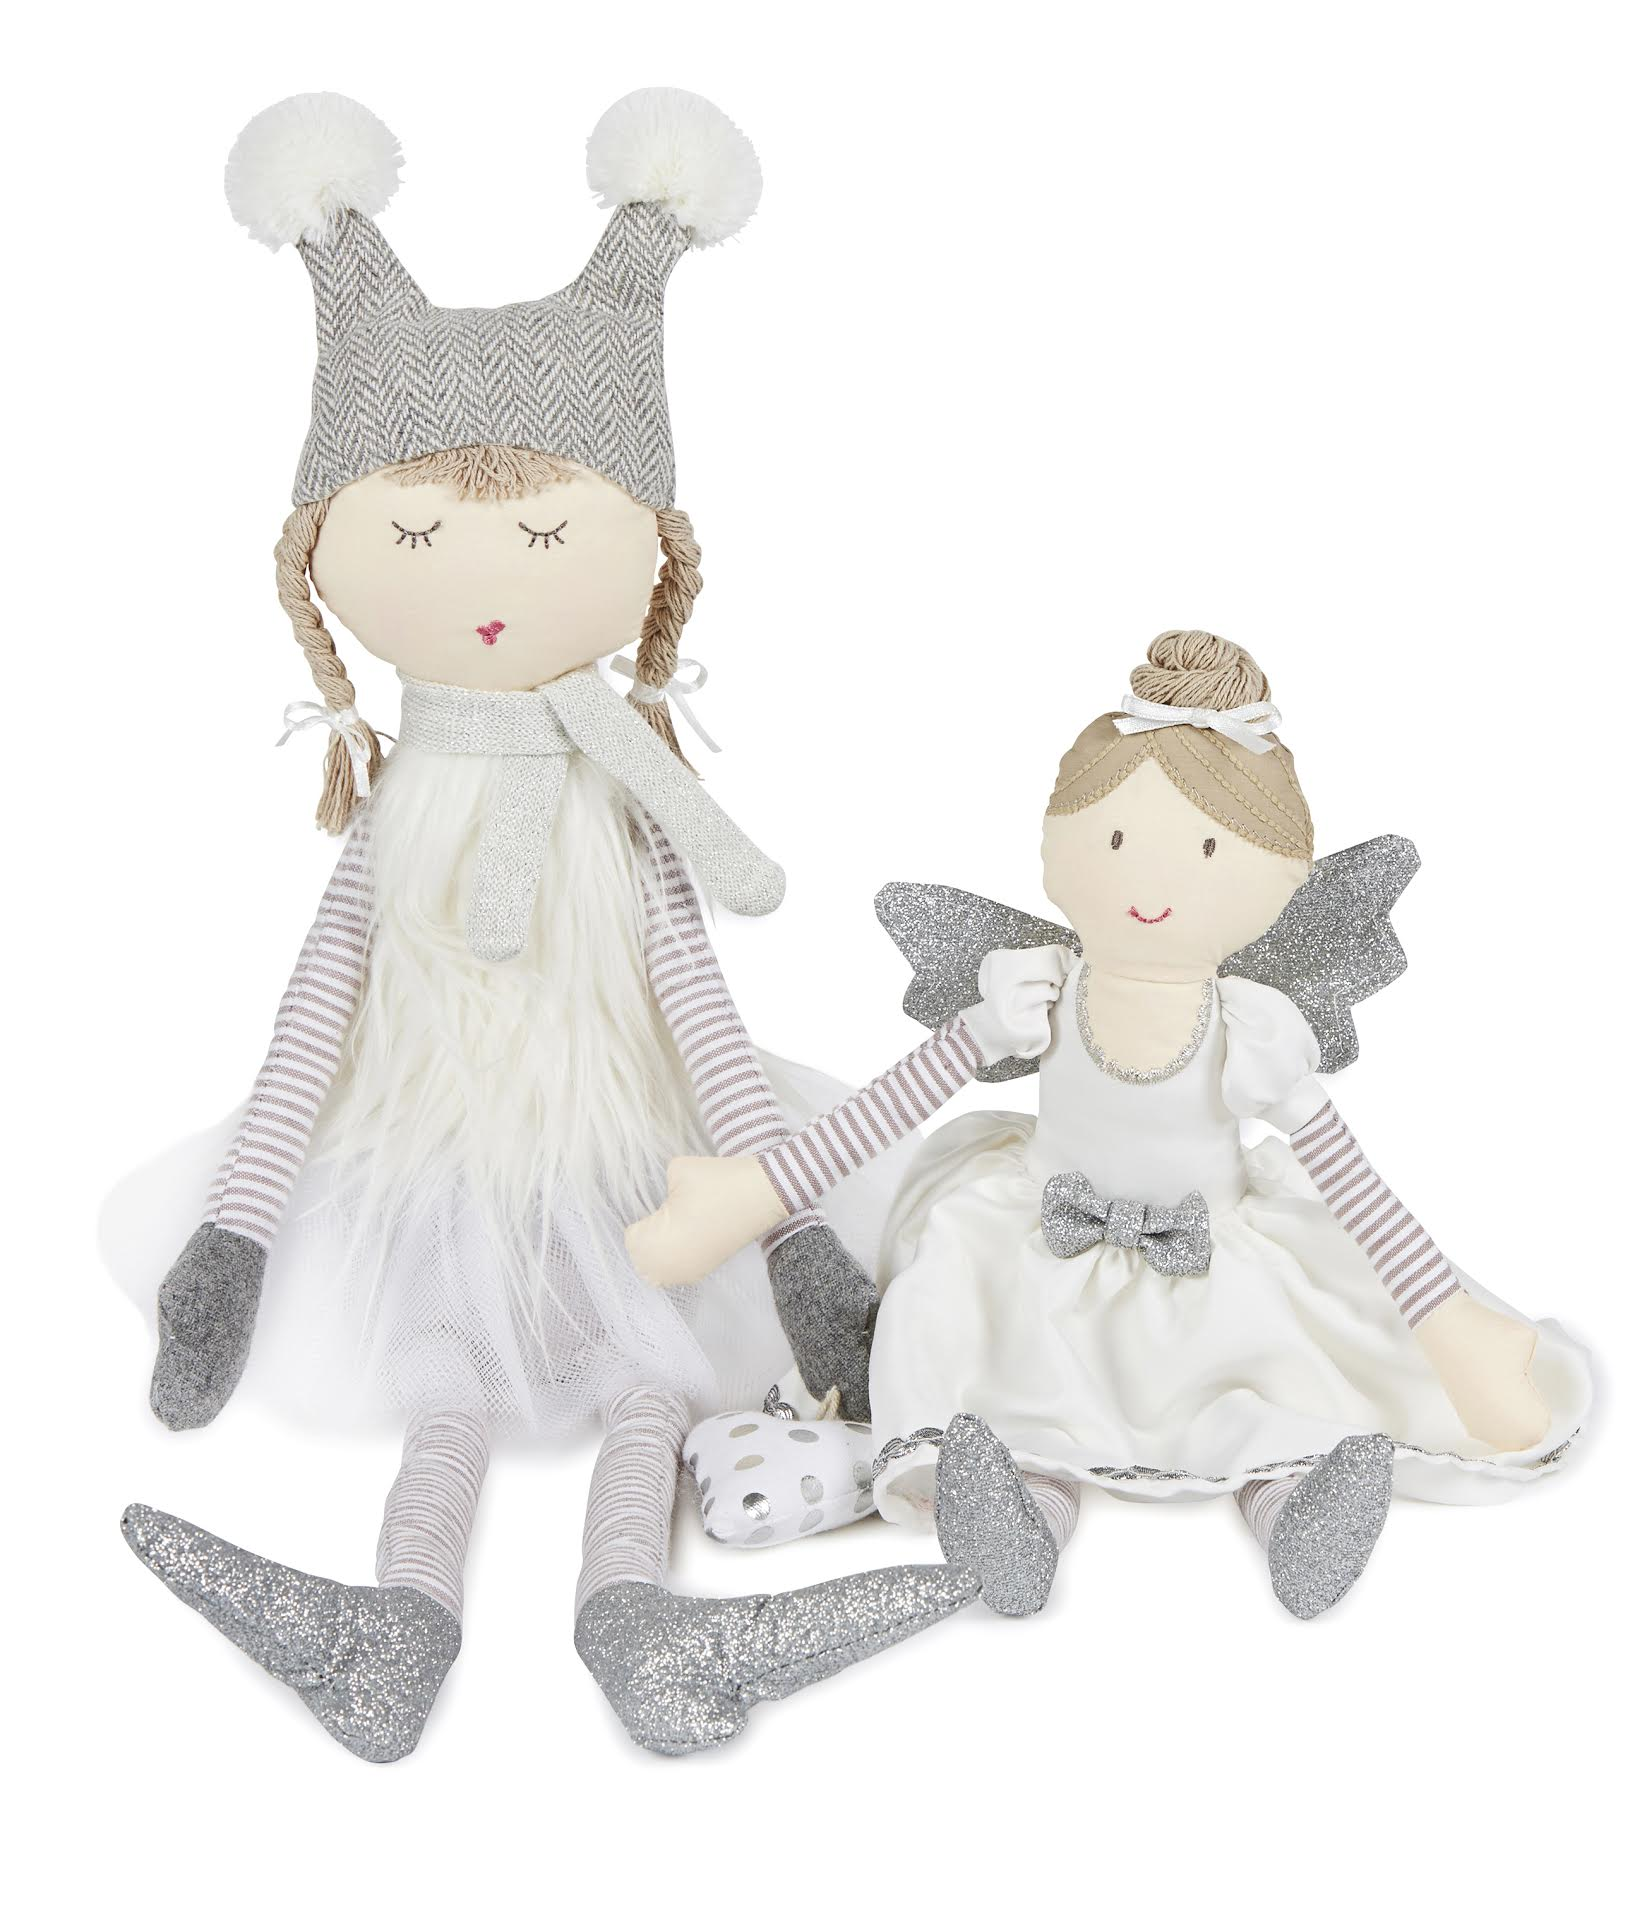 Nana Huchy Bubble Fairy $42 and Sparkles Fairy $32 - makes wishes come true - nanahuchy.com.au